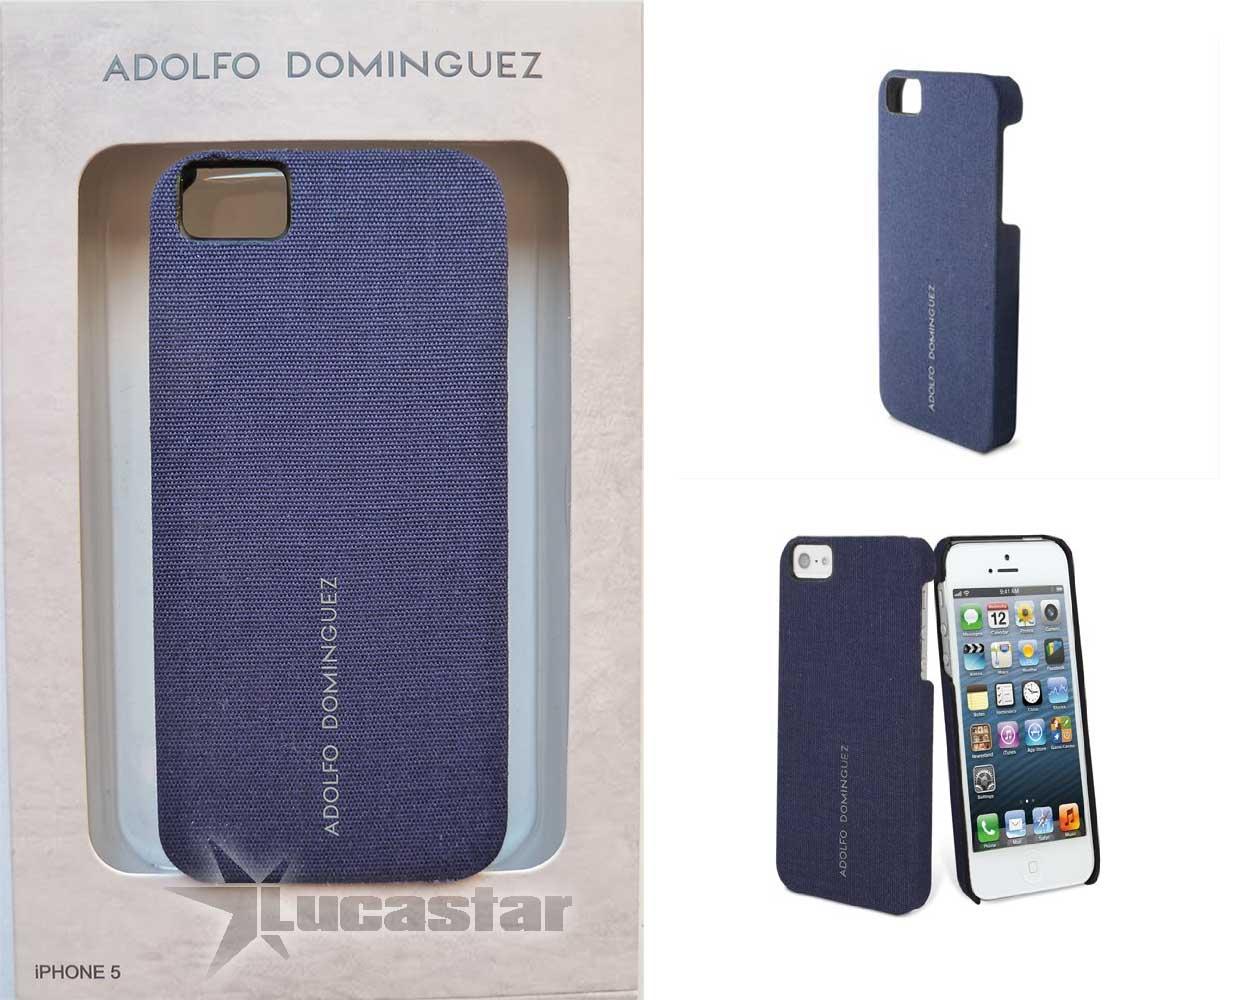 Cargador universal cargador universal de sobremesa idapt1 for Adolfo dominguez calle fuencarral 5